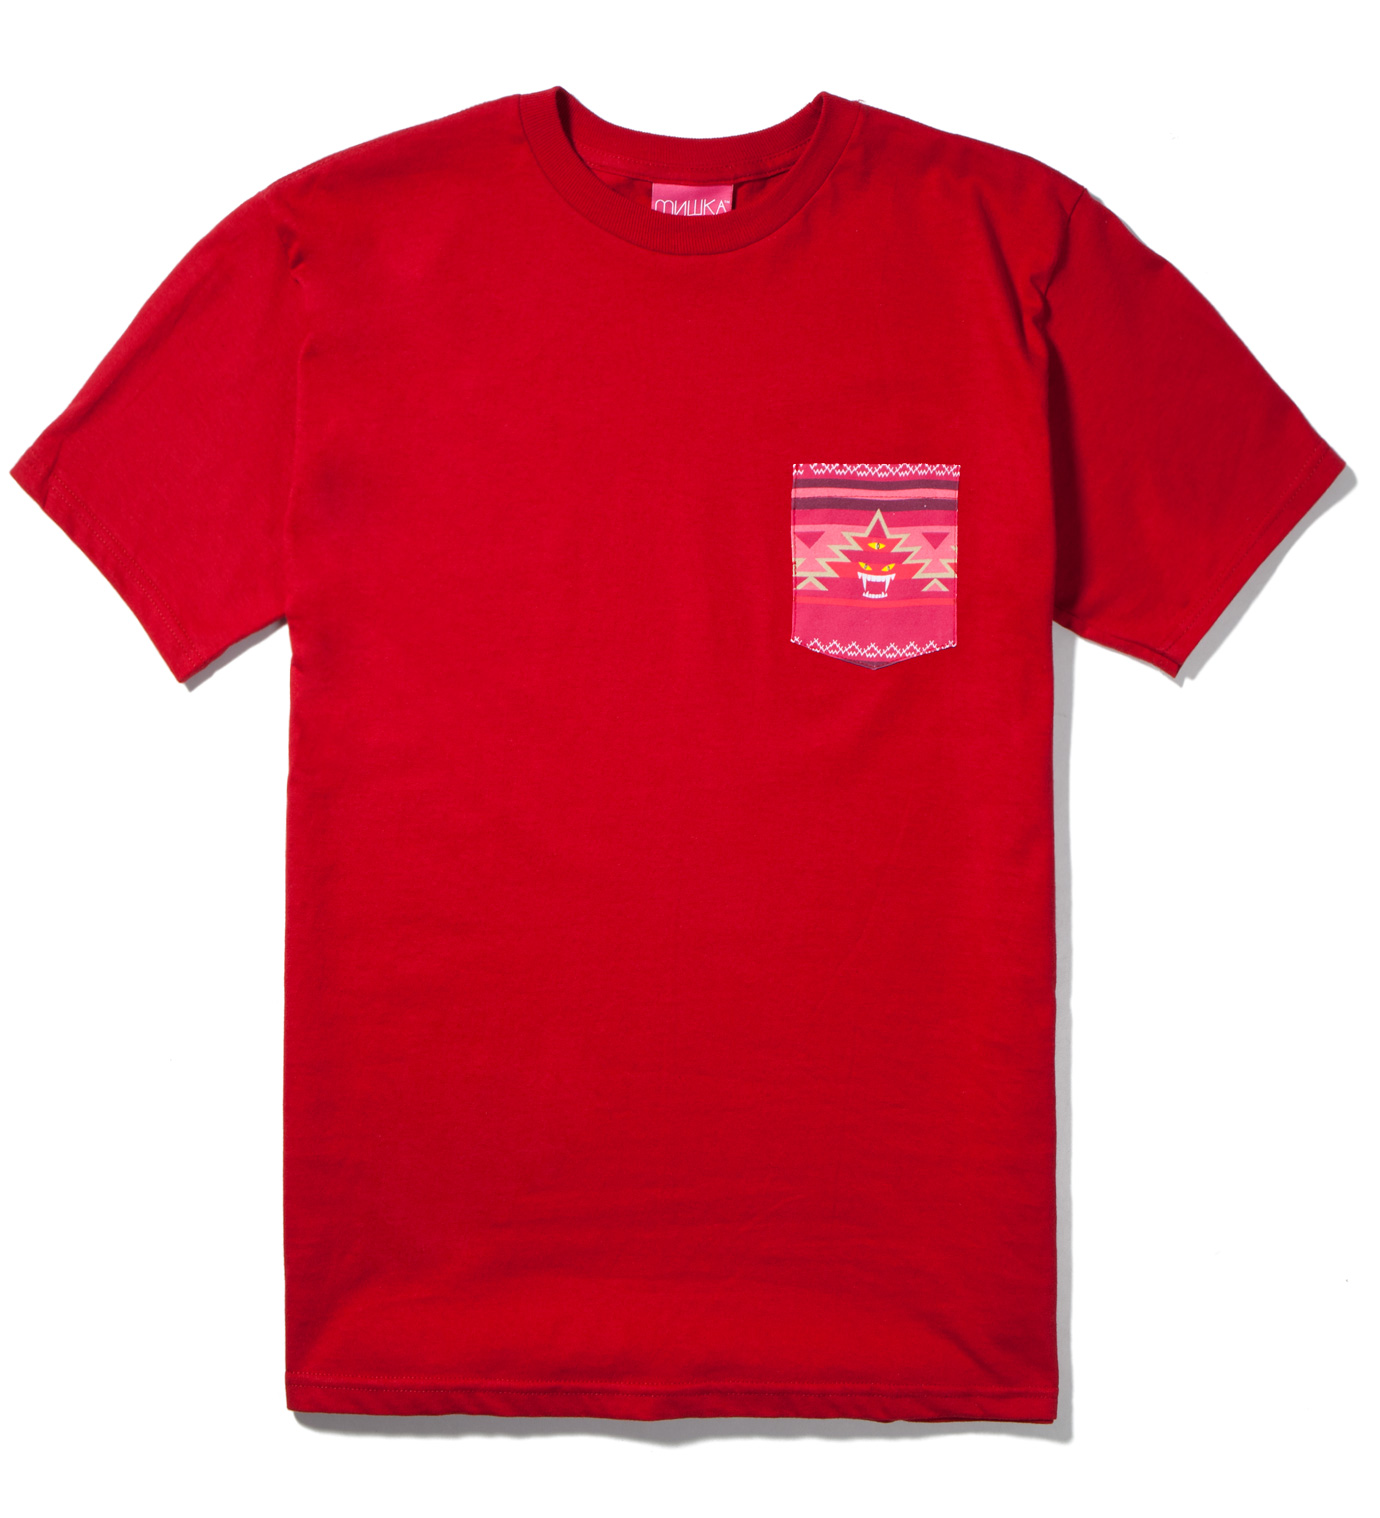 Mishka Cardinal Vision Quest Pocket T-Shirt